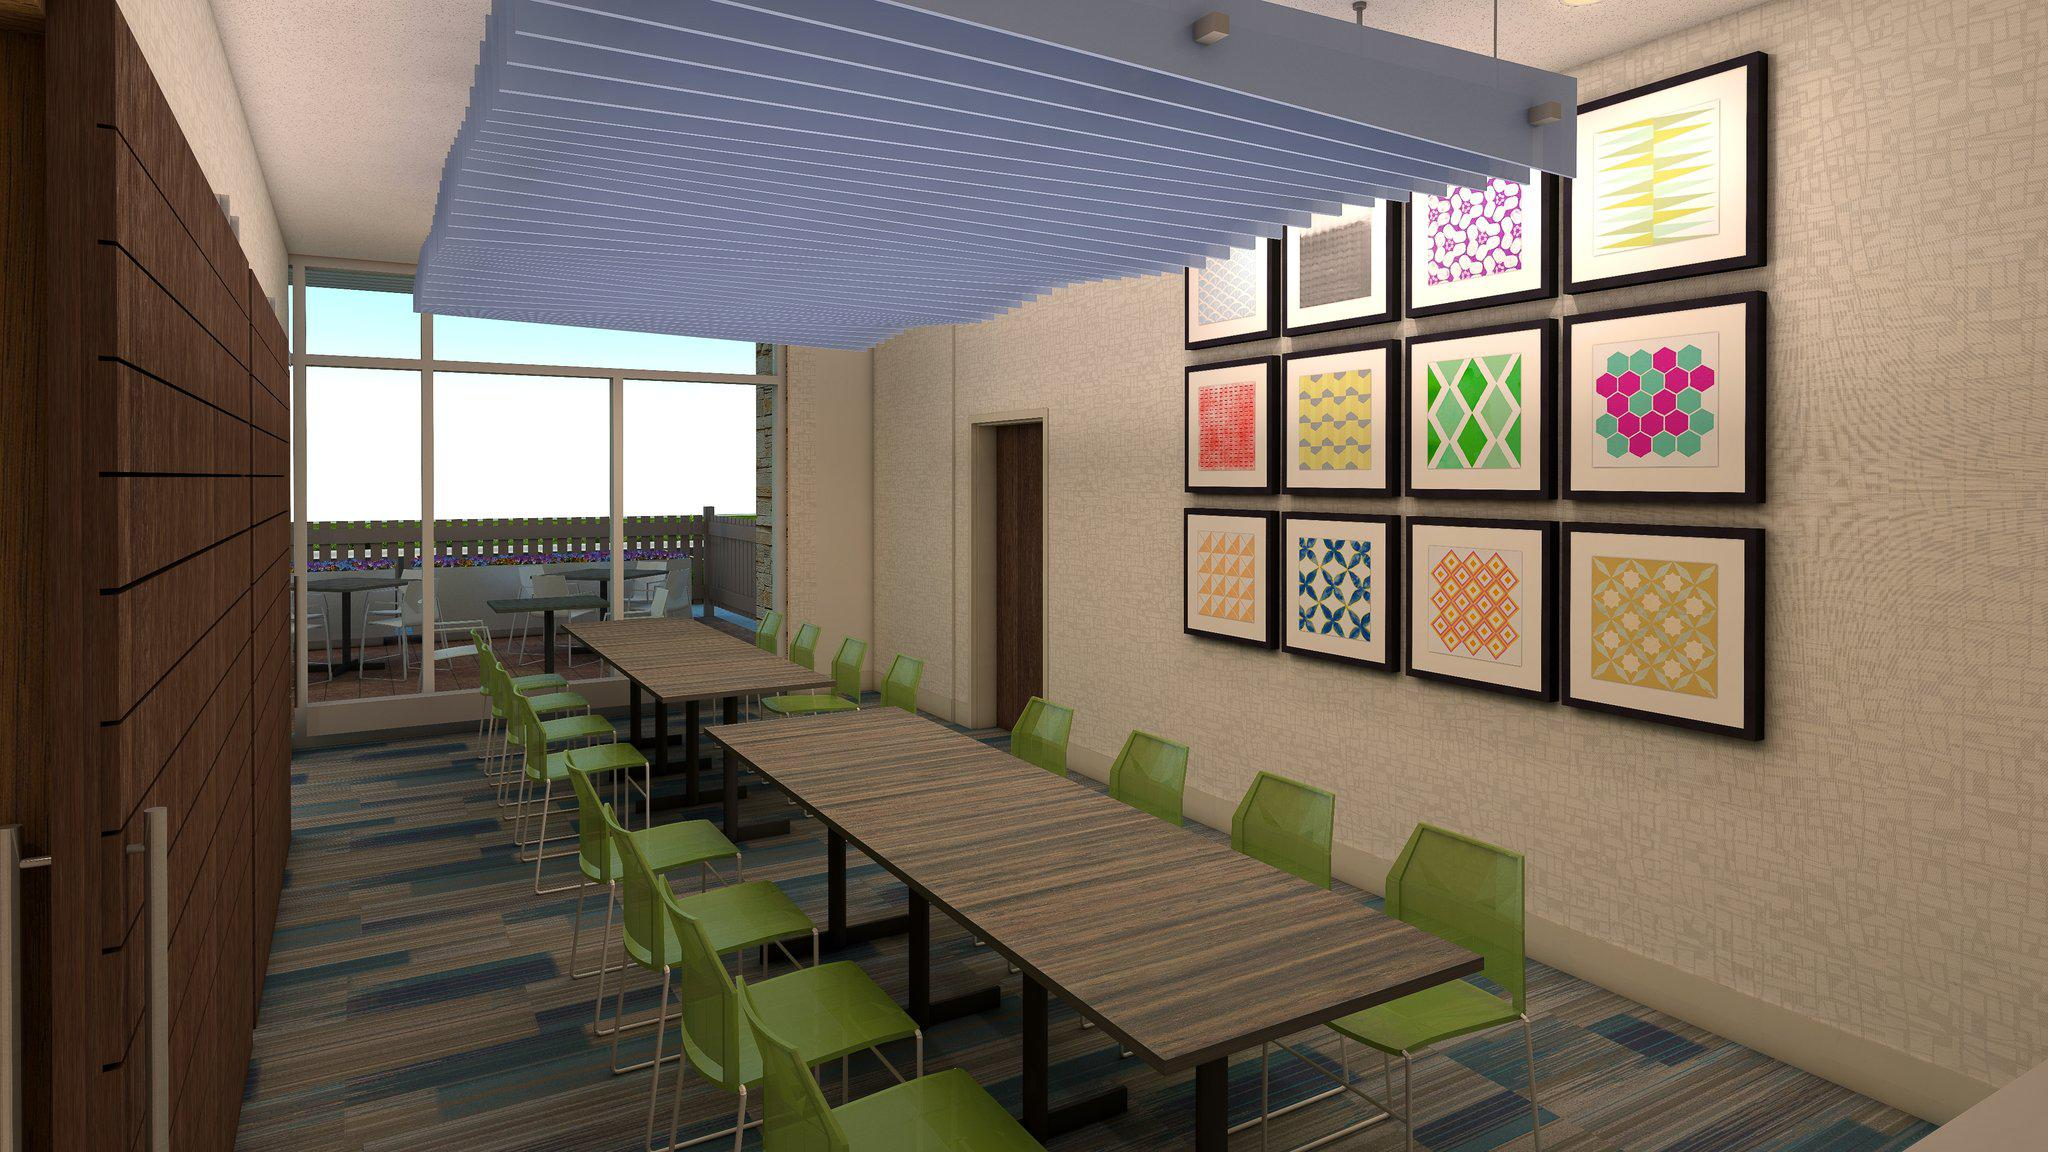 Holiday Inn Express & Suites Denver - Aurora Medical Campus, an IHG Hotel